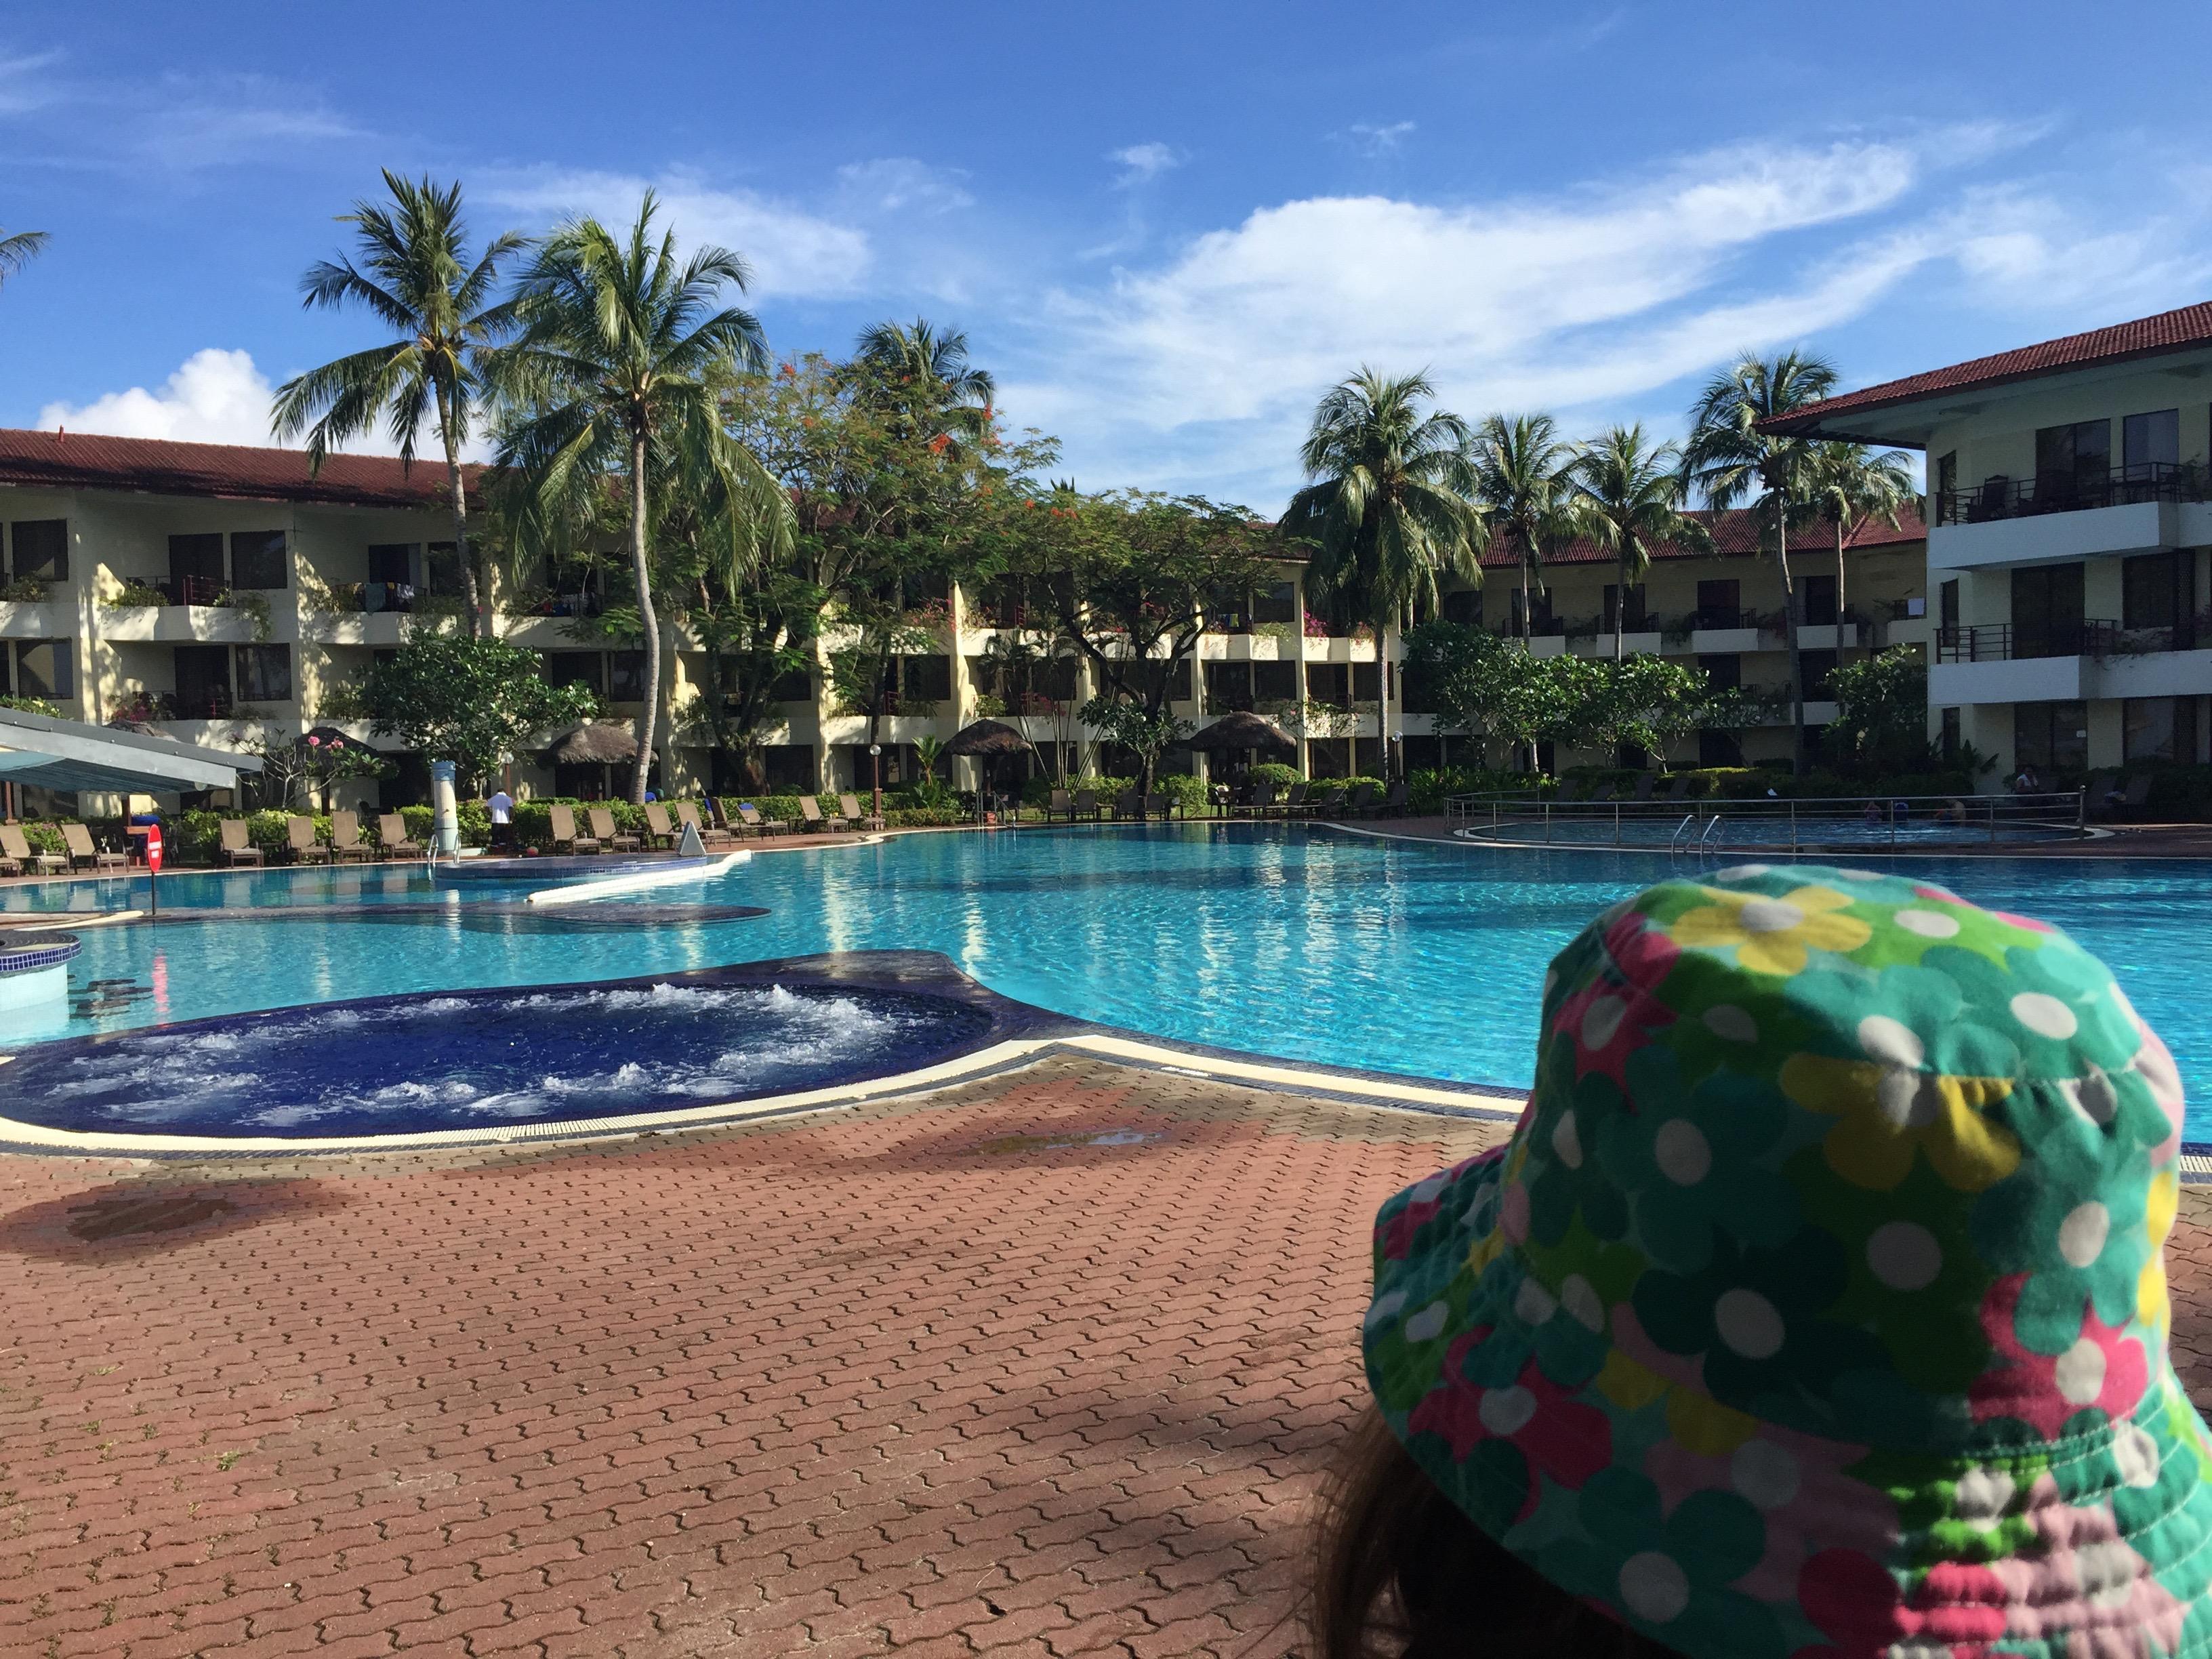 Free pool with swim-up bar